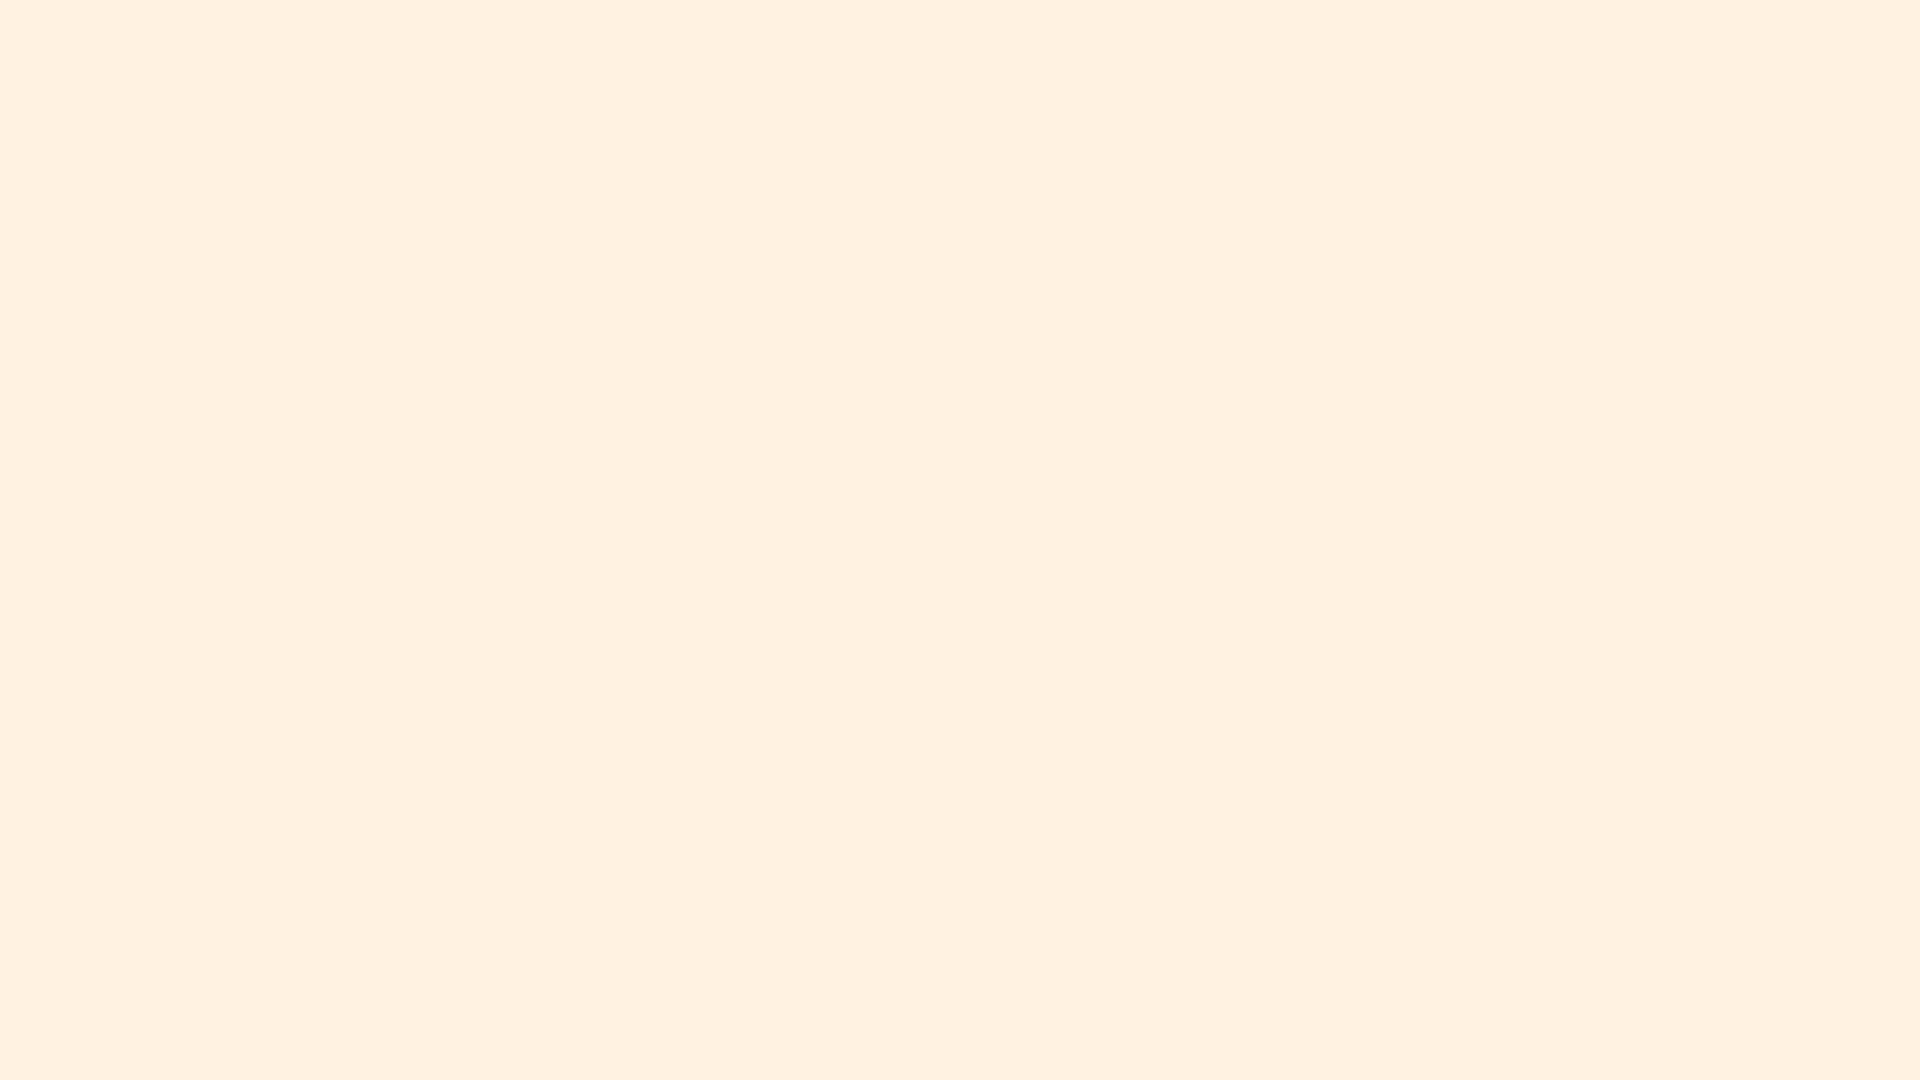 fff3e0 wallpaper 70501